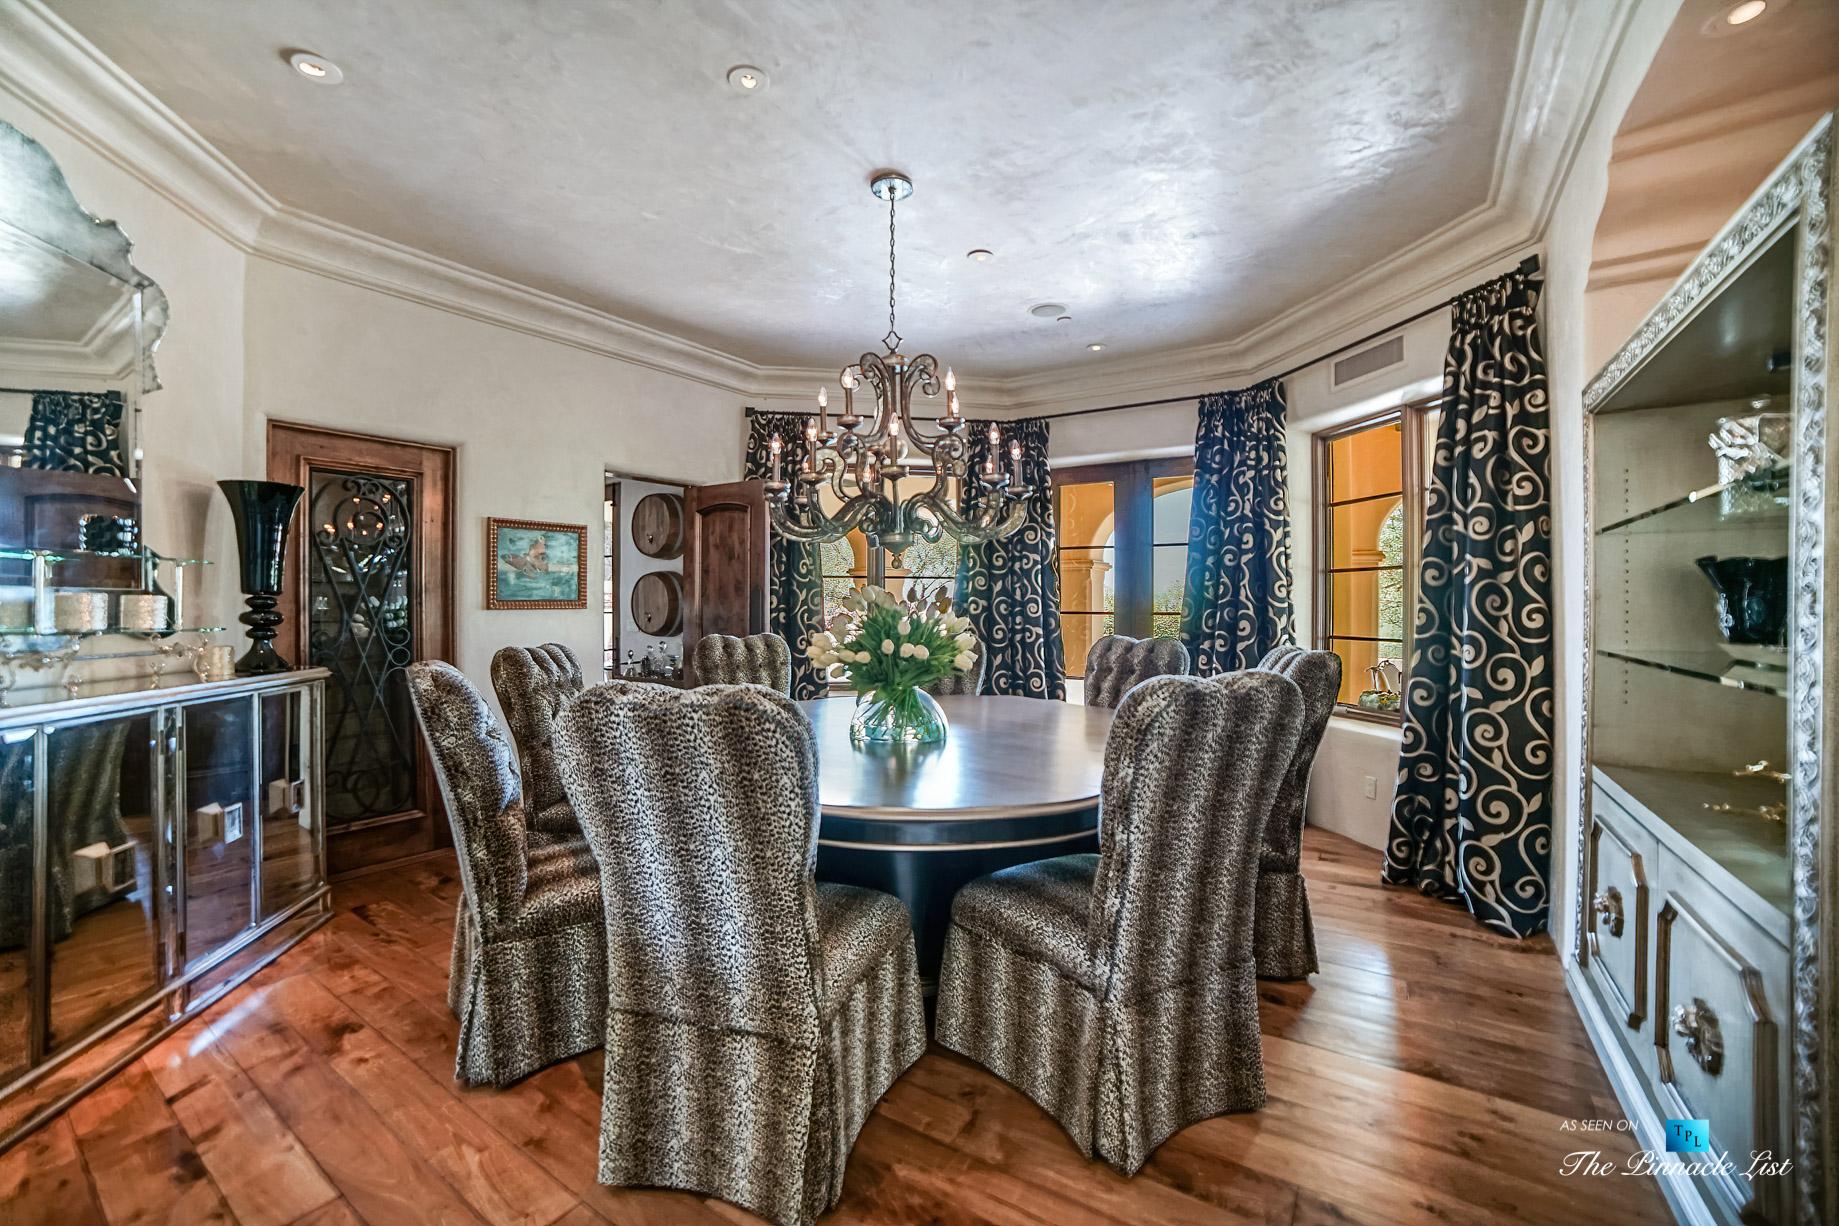 6539 N 31st Pl, Phoenix, AZ, USA – Dining Room – Luxury Real Estate – Biltmore Mountain Estates – Spanish Colonial Home